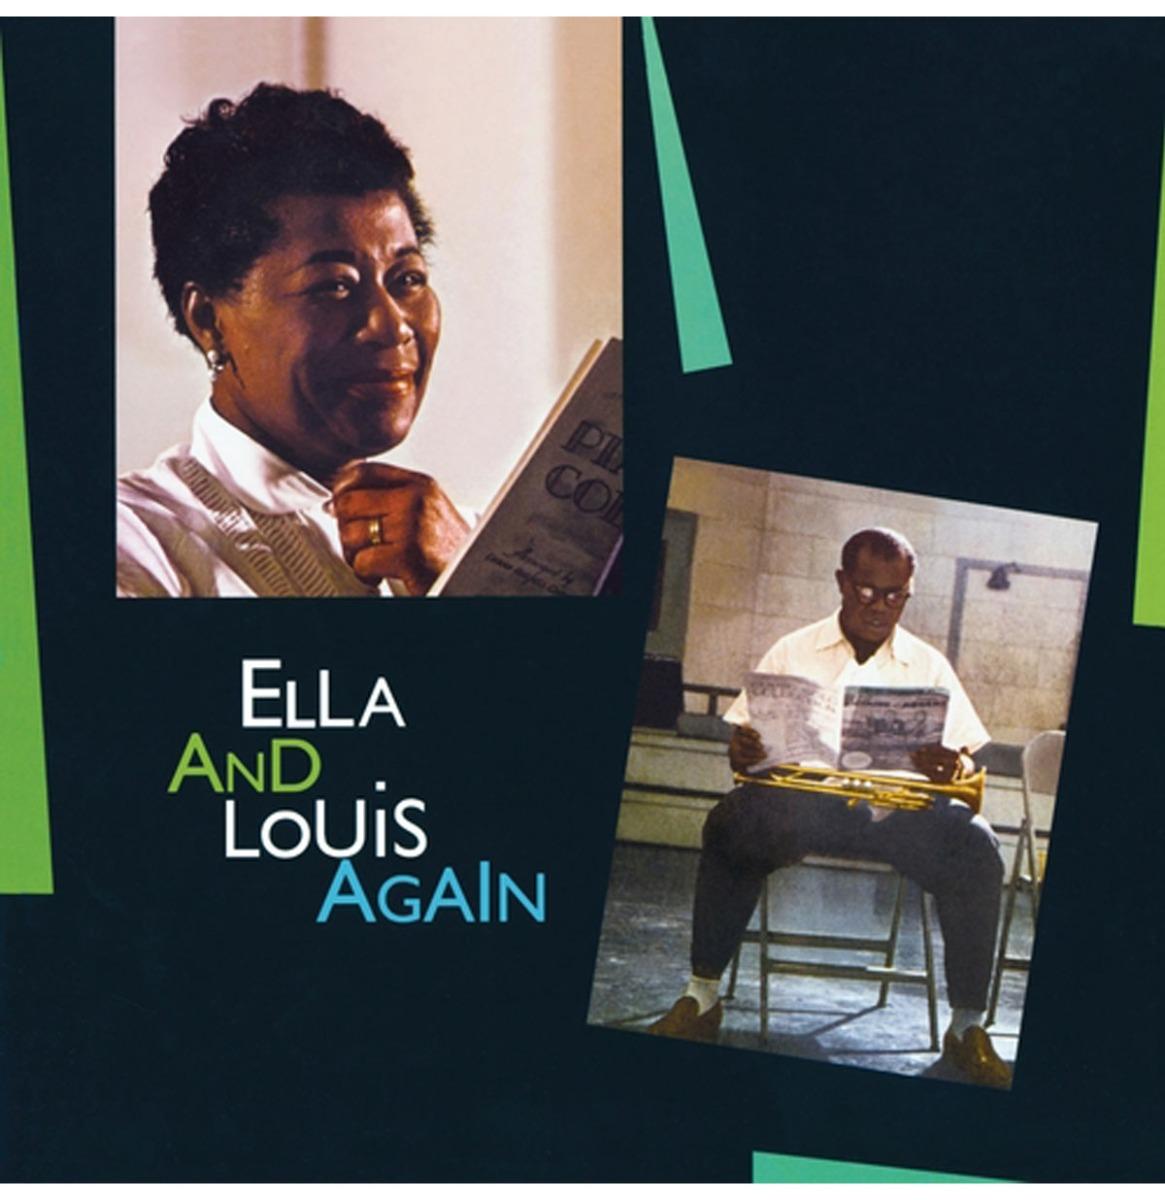 Ella Fitzgerald & Louis Armstrong - Ella And Louis Again (Gekleurd Vinyl) LP